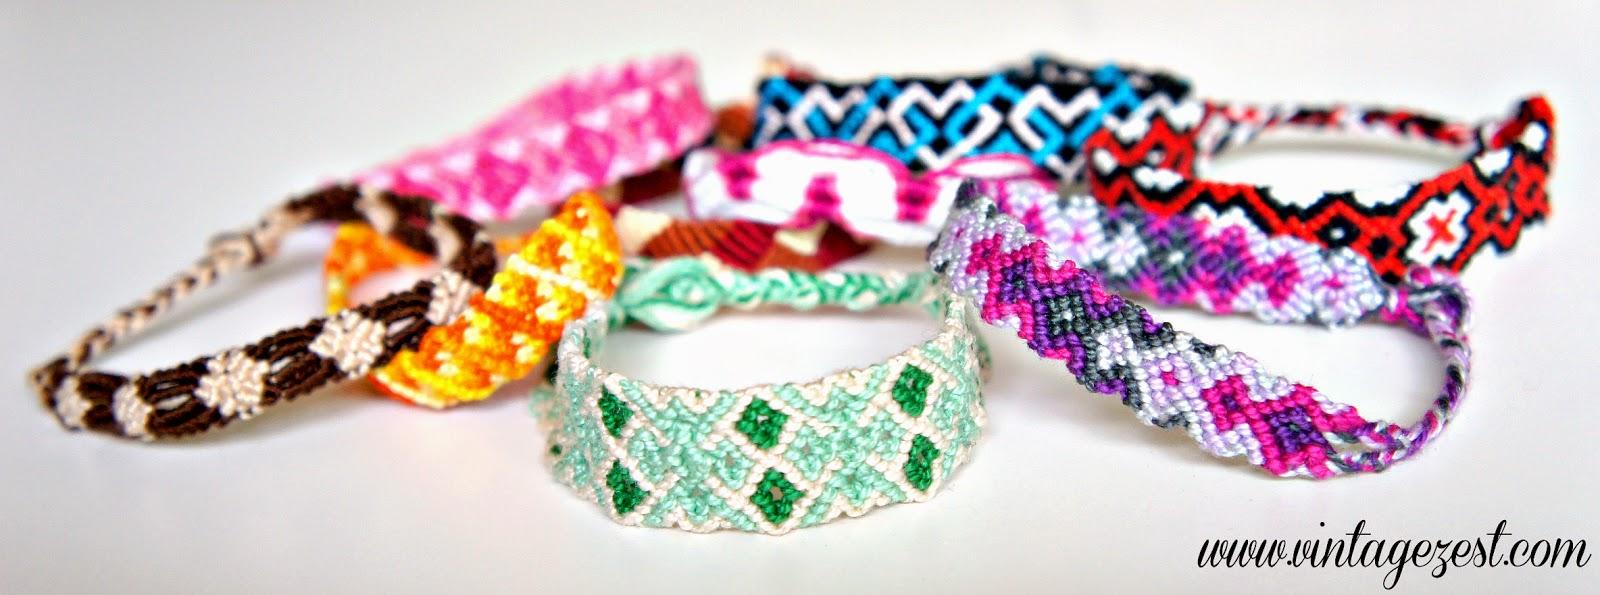 Craft Rewind: Friendship Bracelets on Diane's Vintage Zest!